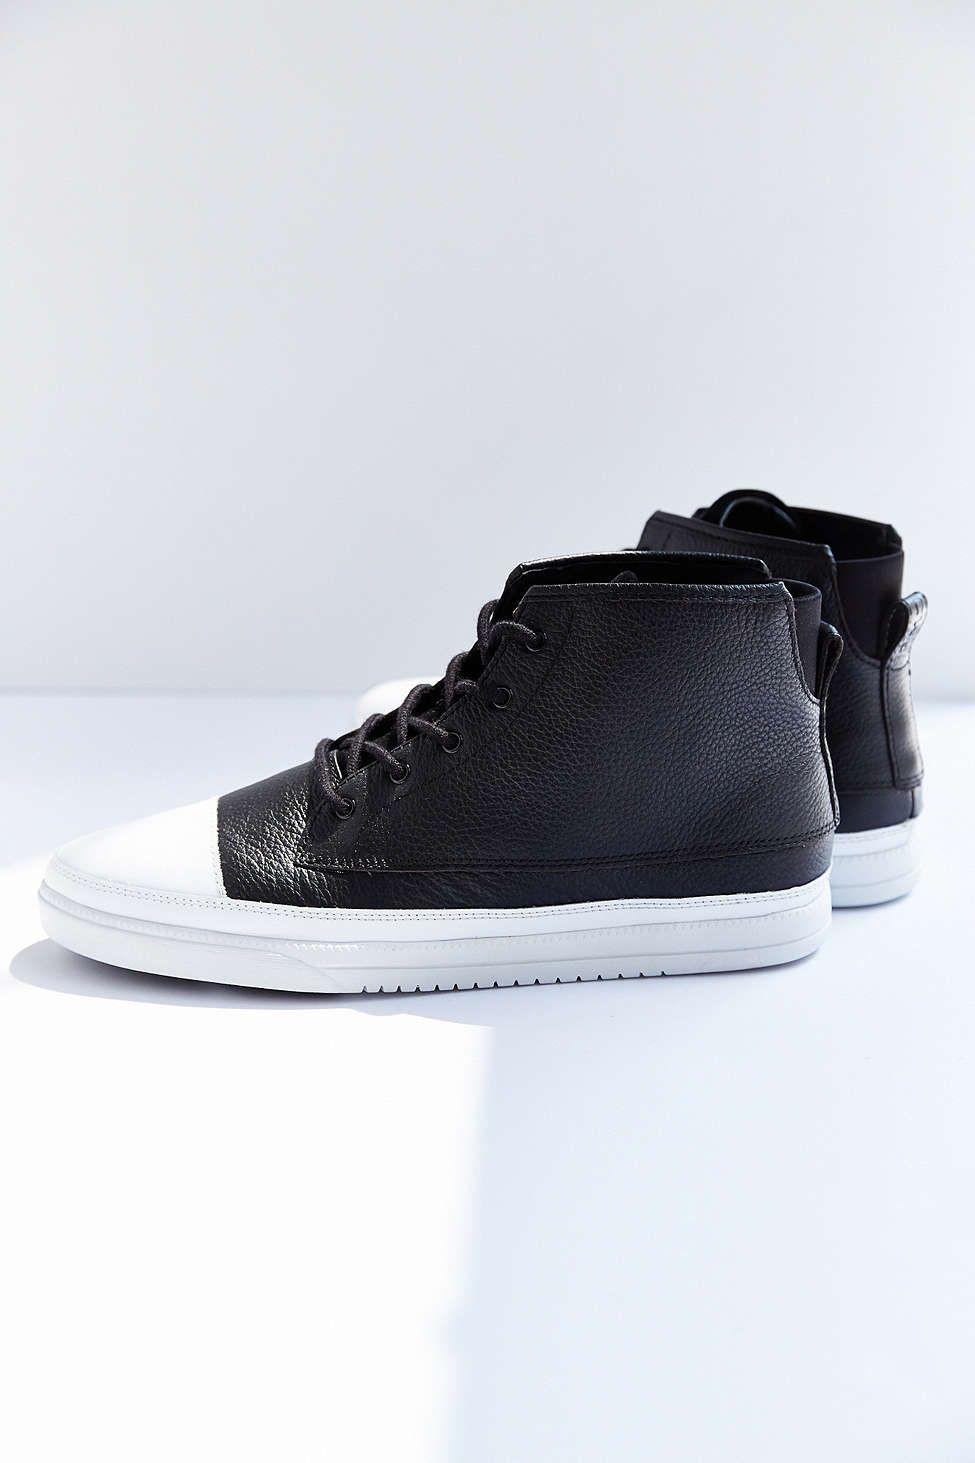 FOOTWEAR - High-tops & sneakers Clae ped8XhzR5L